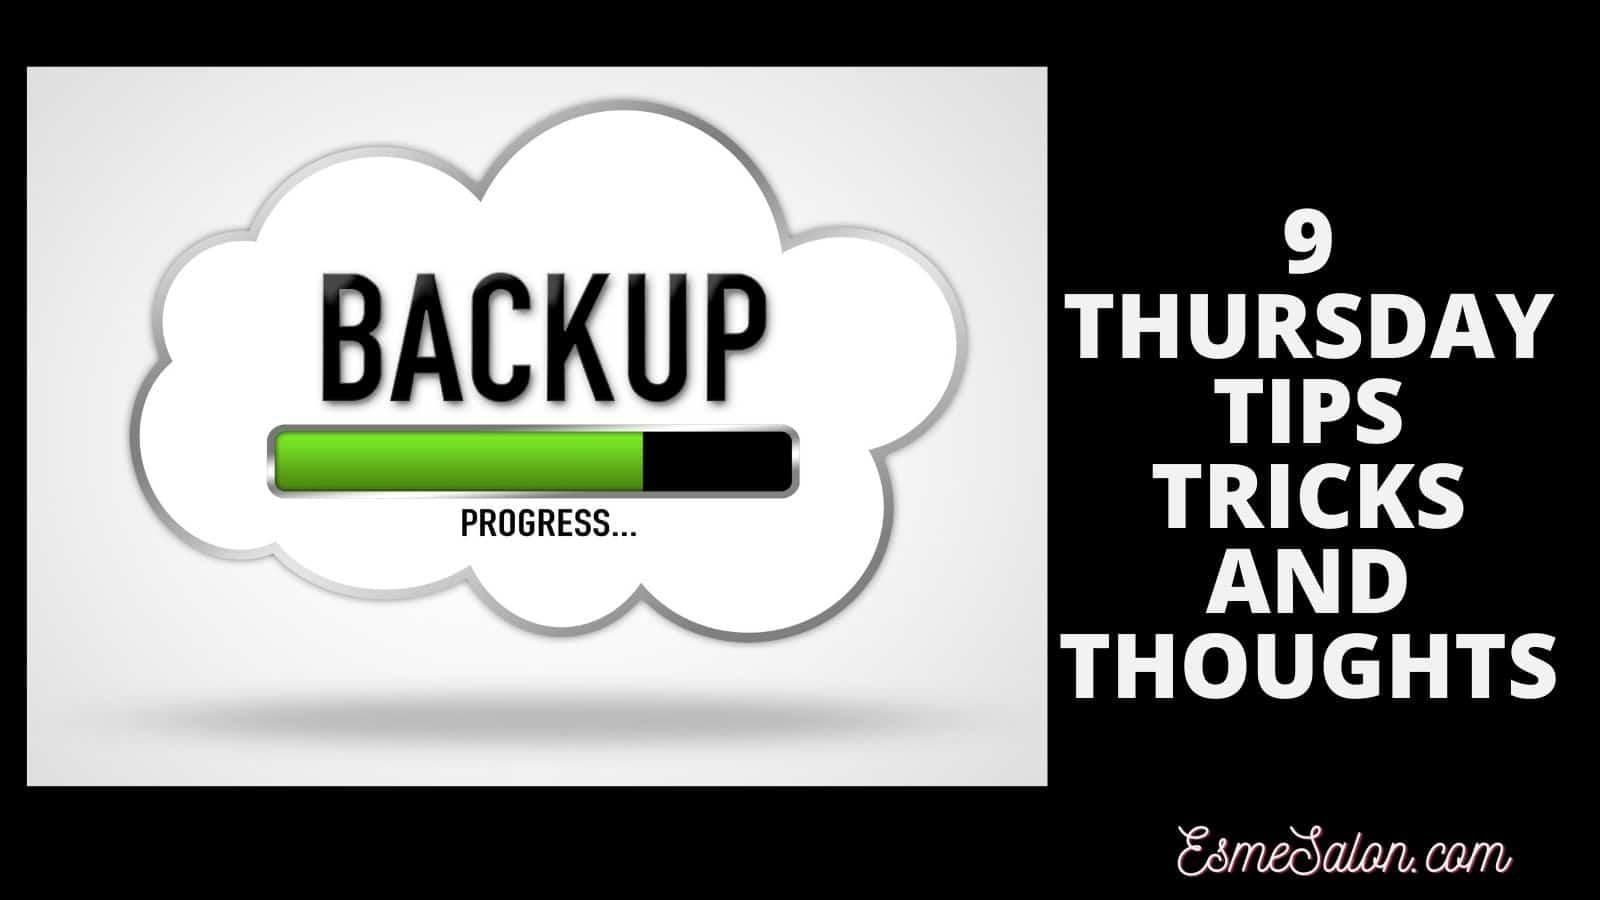 Backup of computer